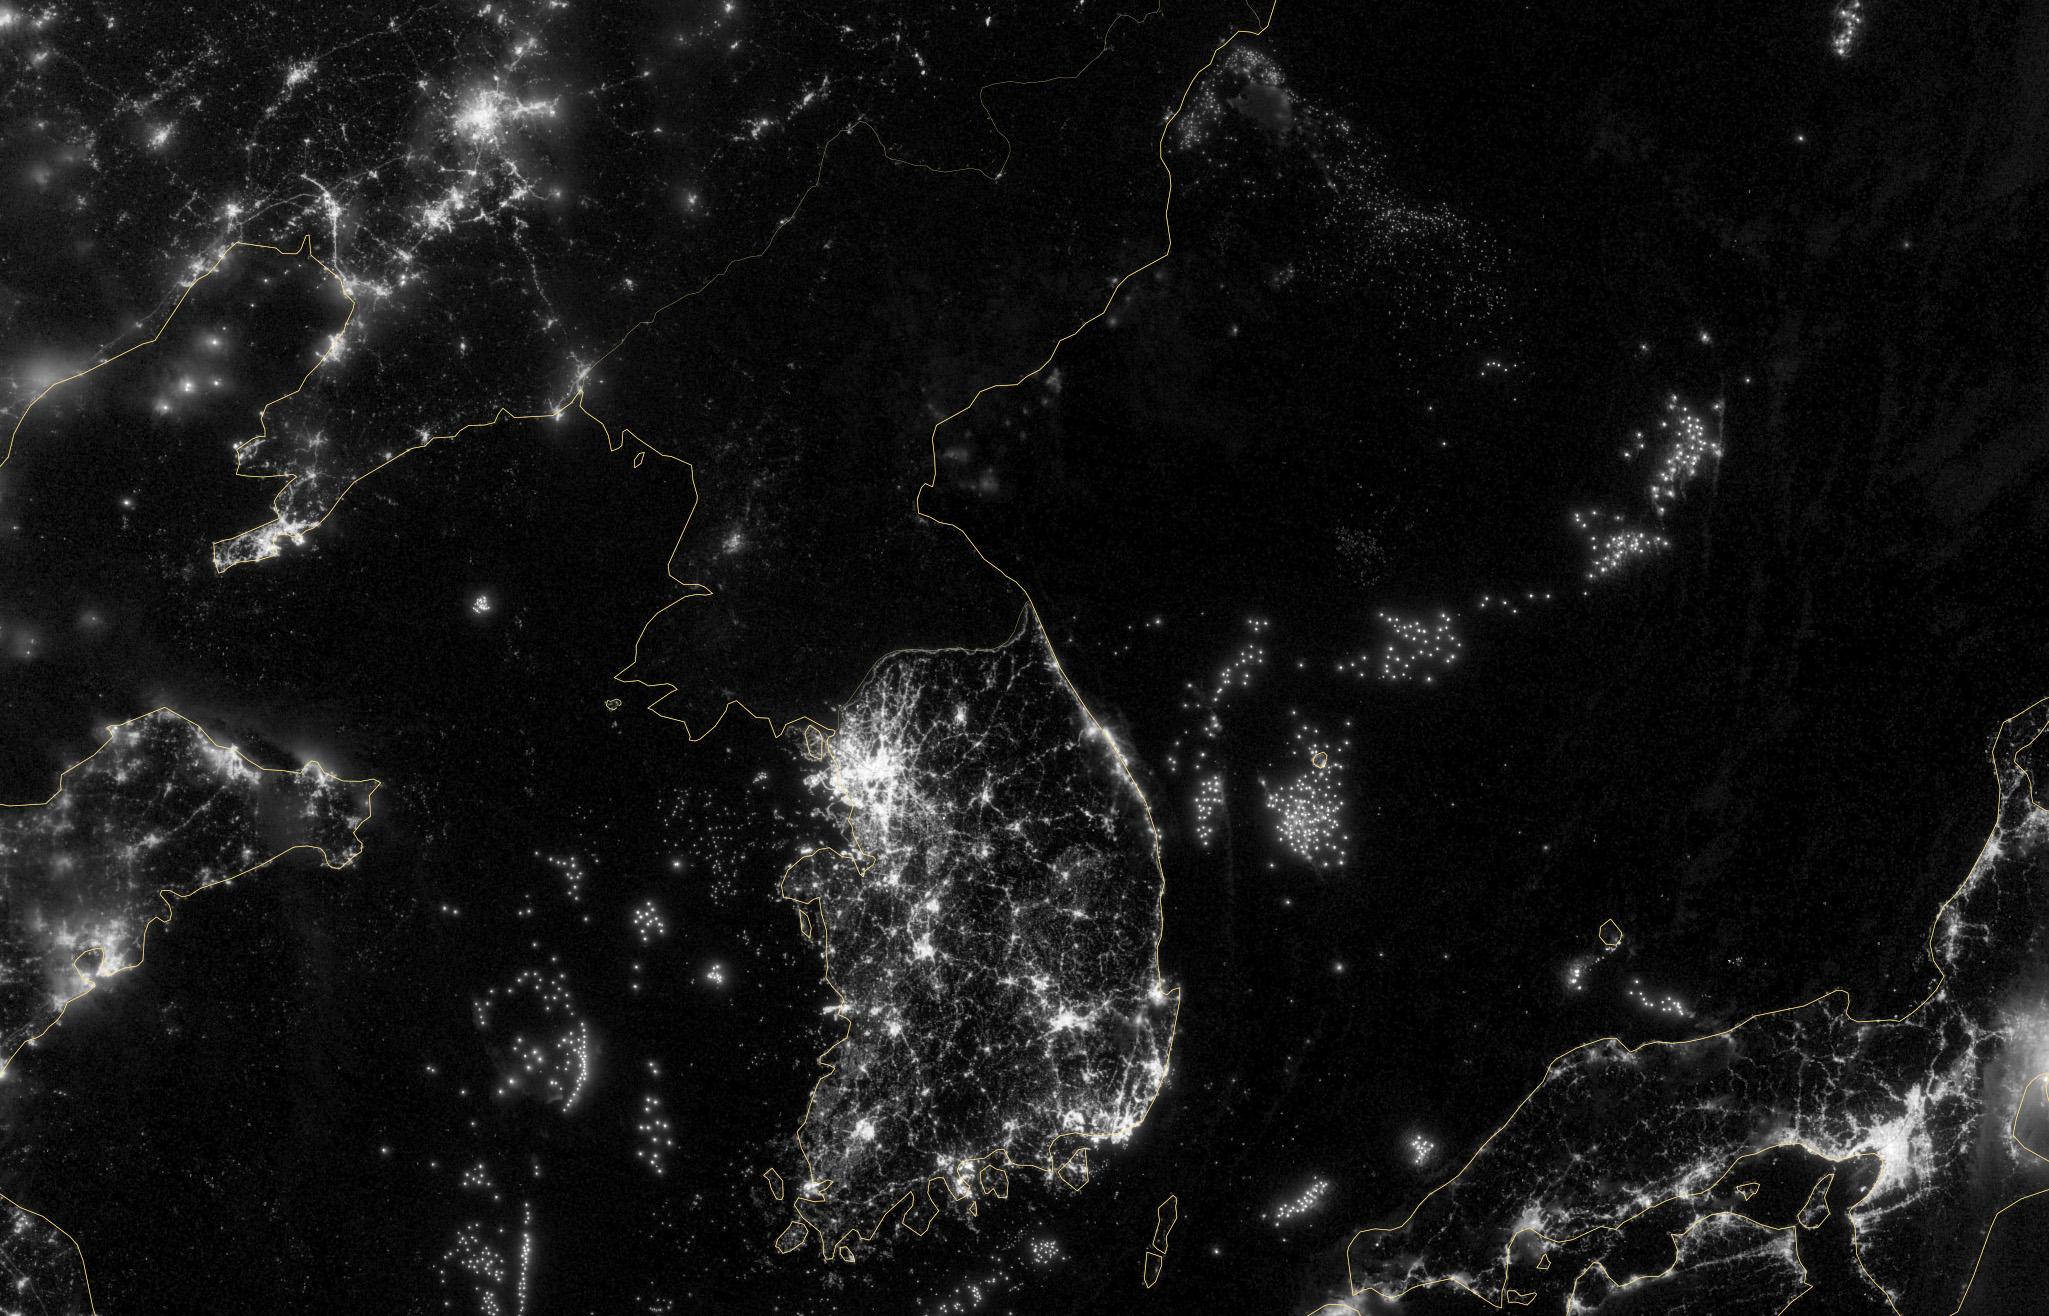 North Korea Defends Blackout Satellite Photos The